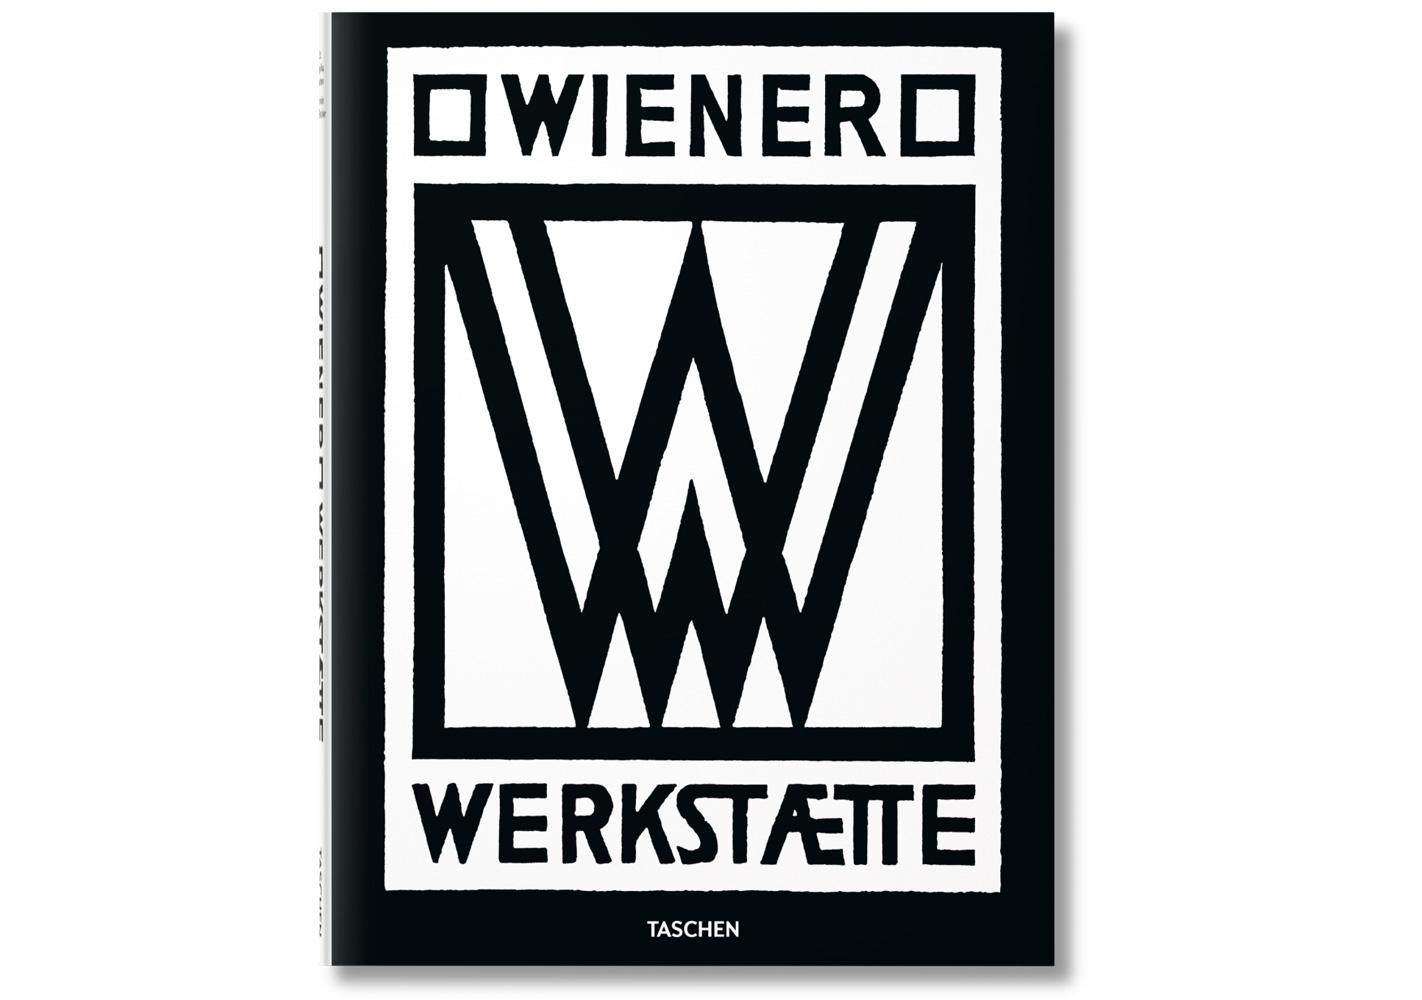 Livre Ju Wiener Werkstatte - TASCHEN